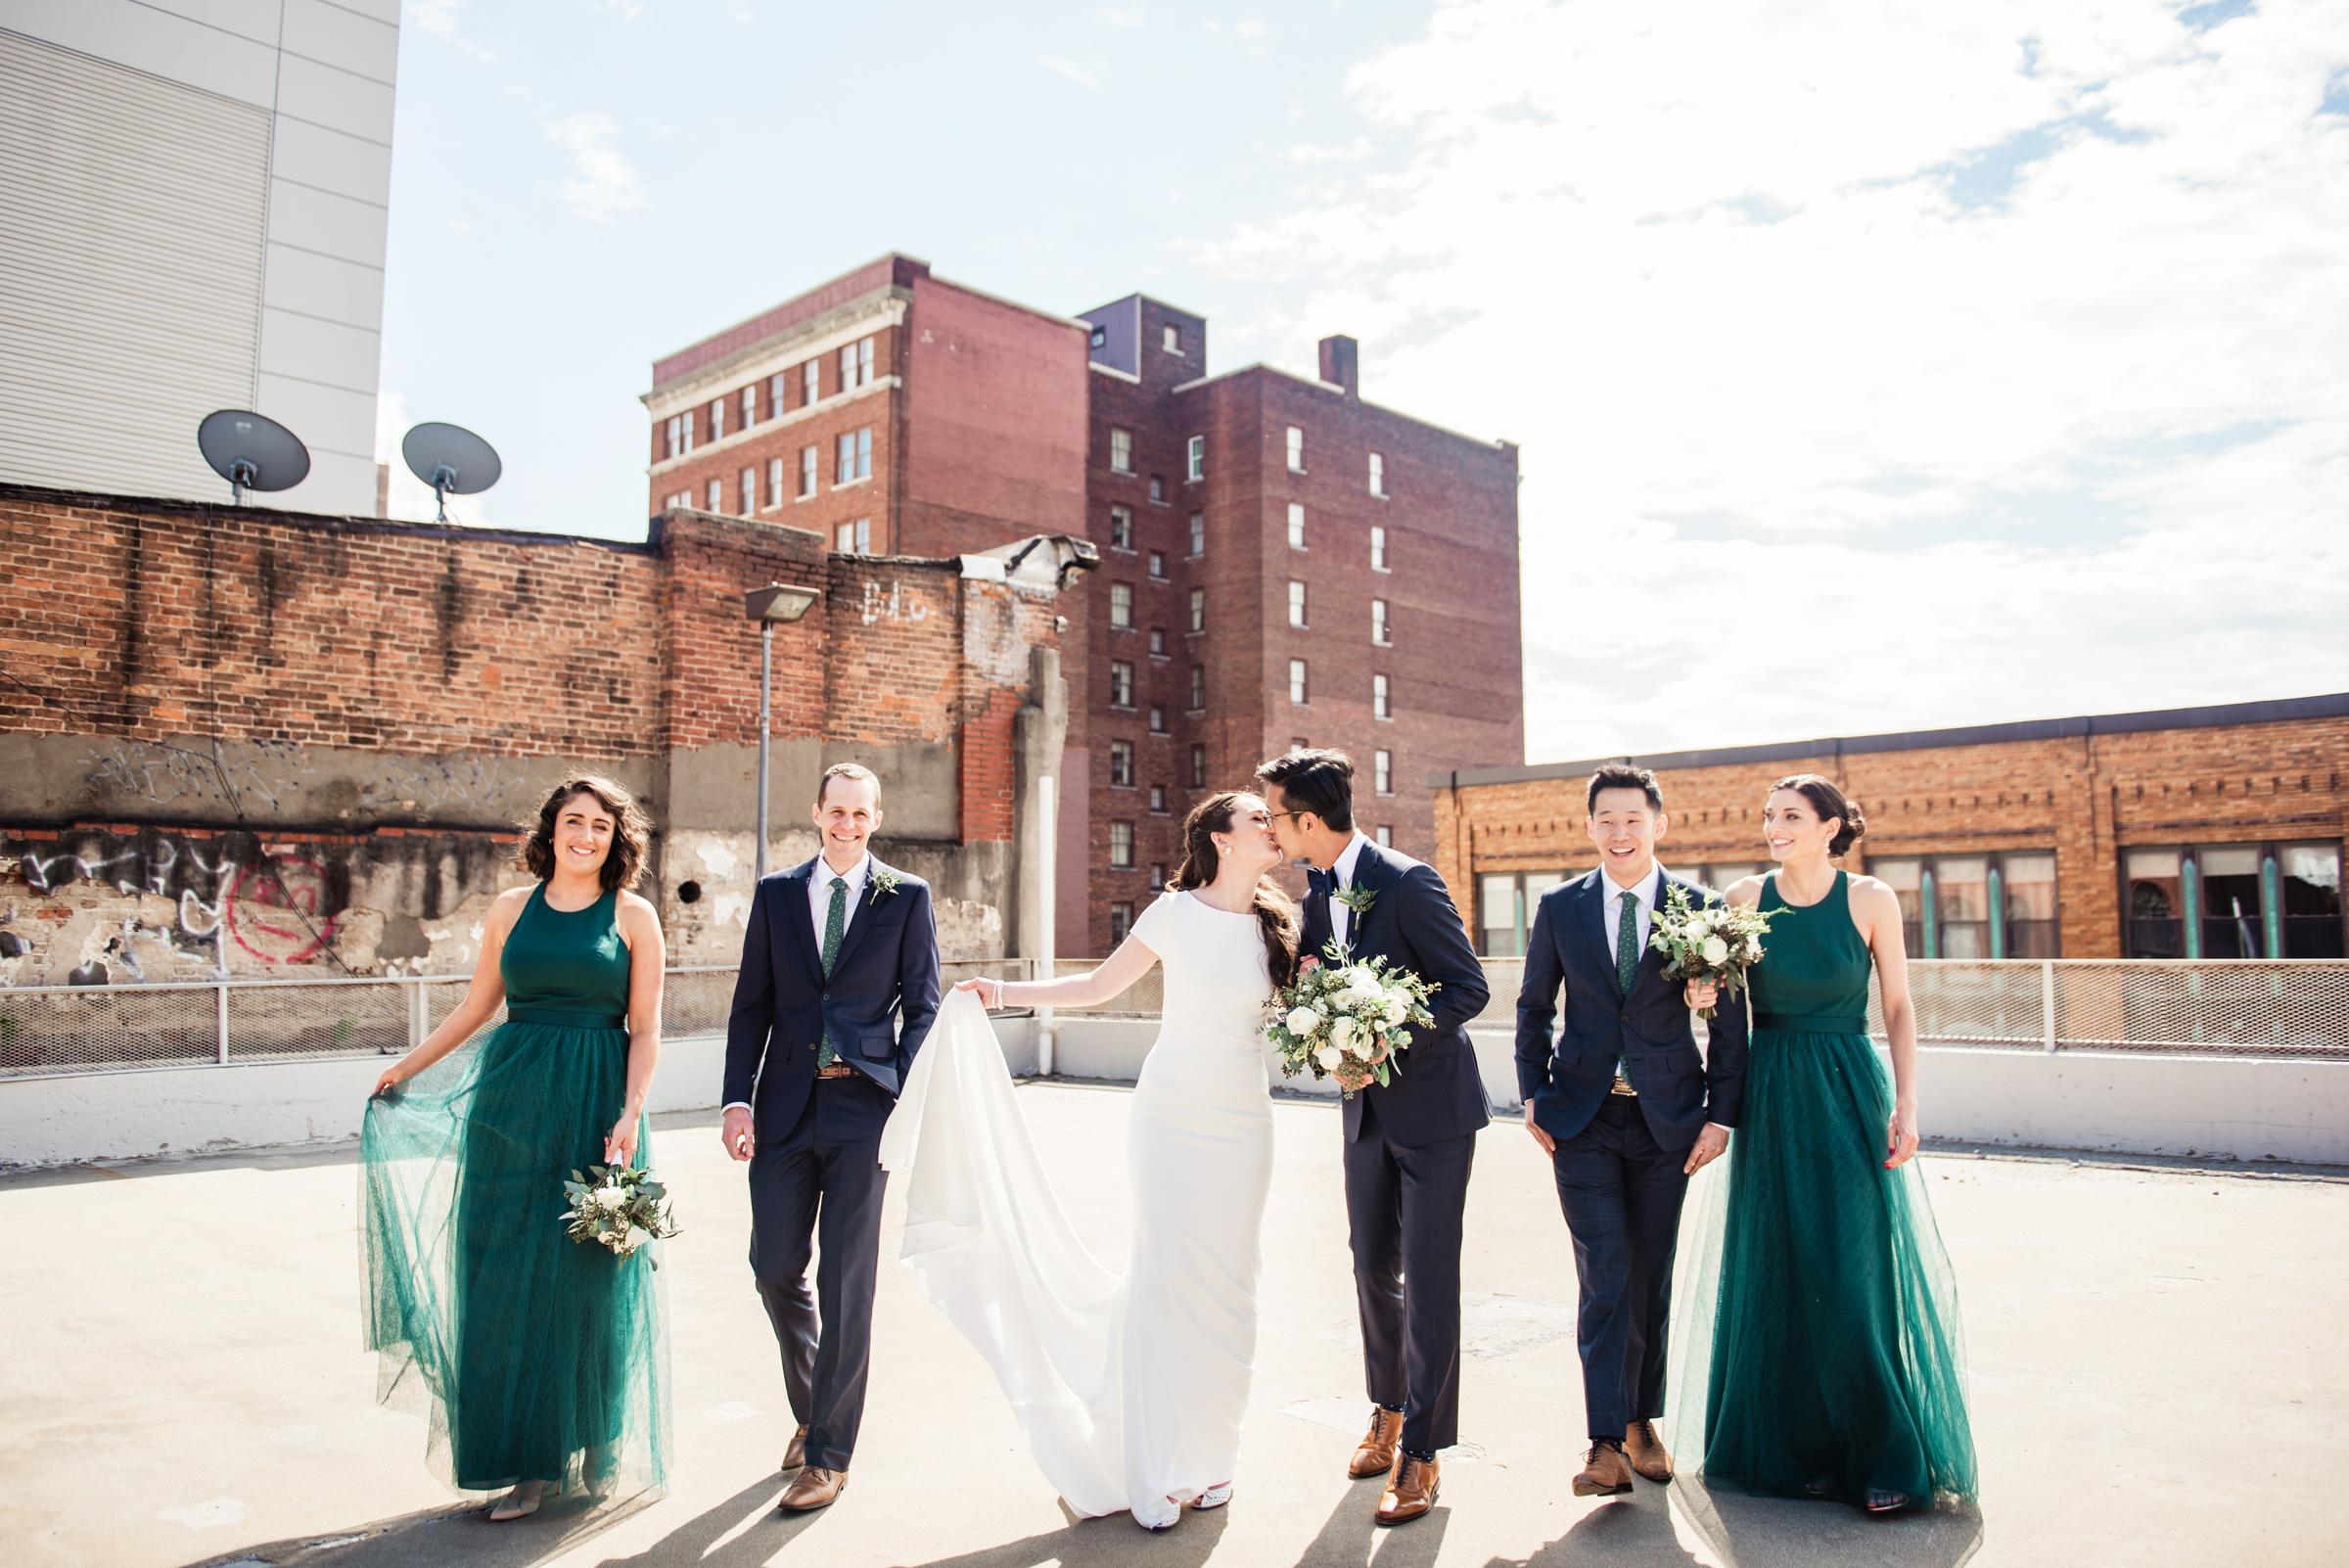 SKY_Armory_Syracuse_Wedding_JILL_STUDIO_Rochester_NY_Photographer_DSC_5564.jpg